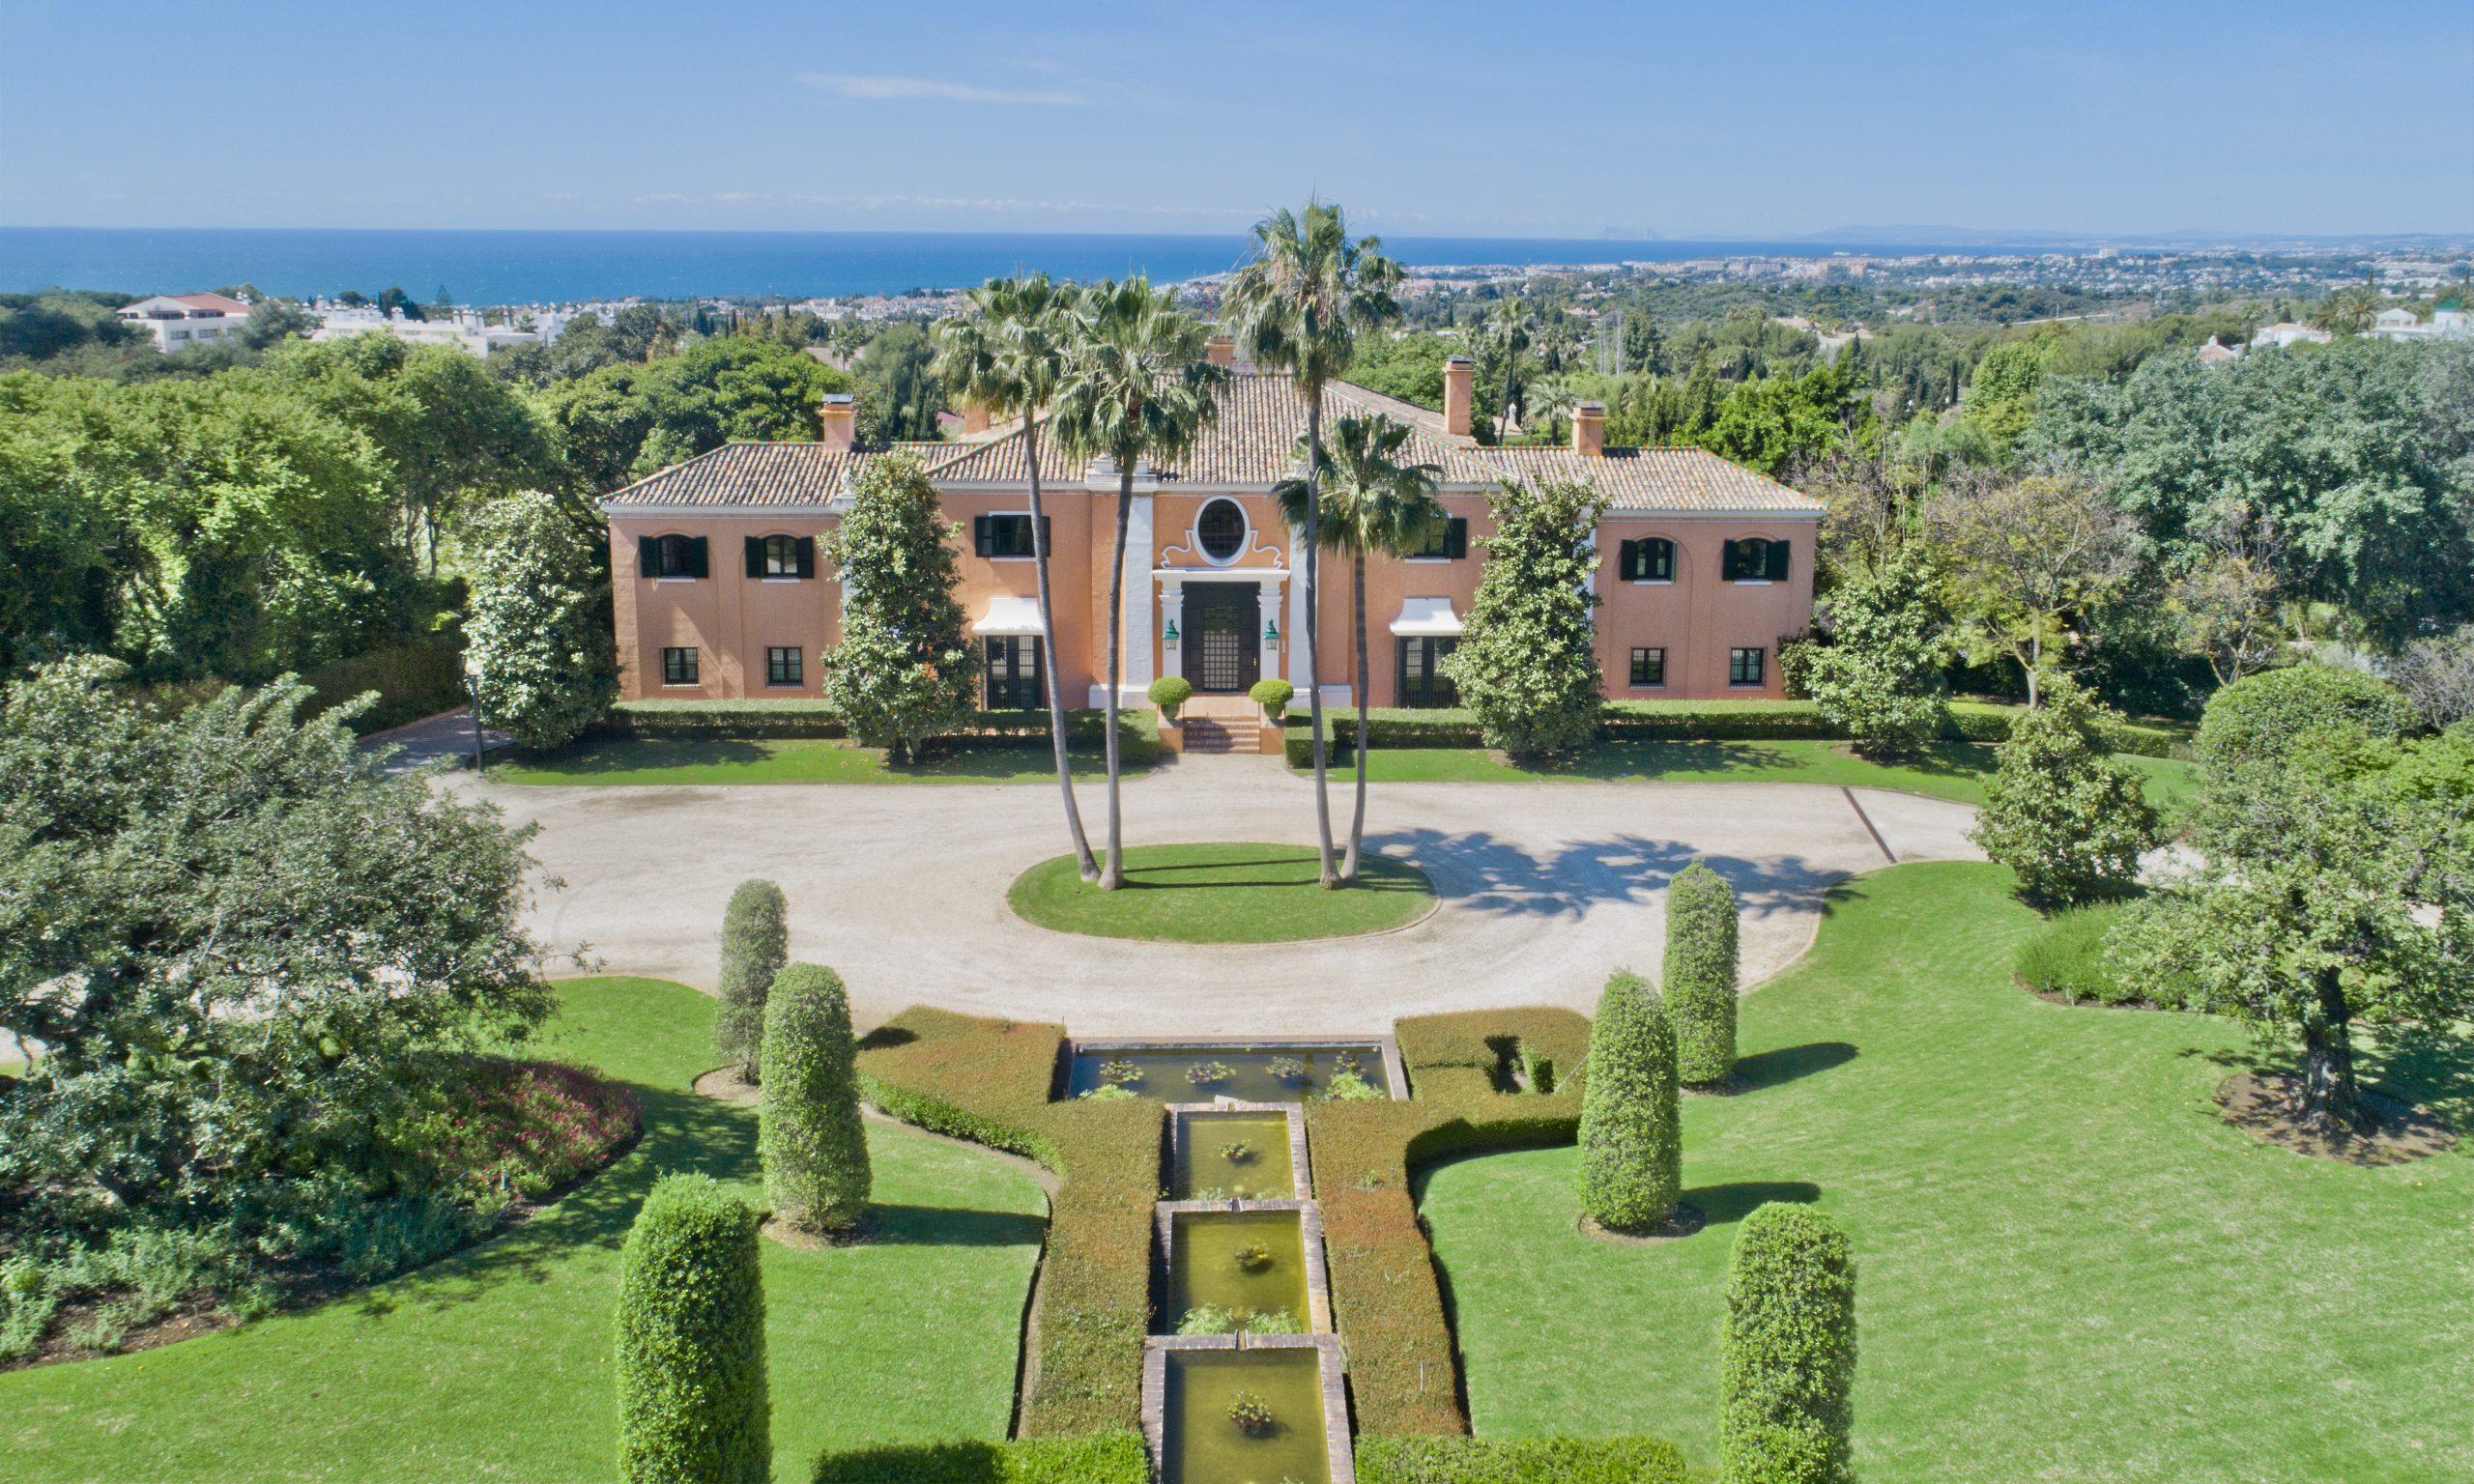 Property Photography Marbella, Gary Edwards, Real Estate Photography Marbella, Photos Marbella, Photographer Marbella, Marbella Drone